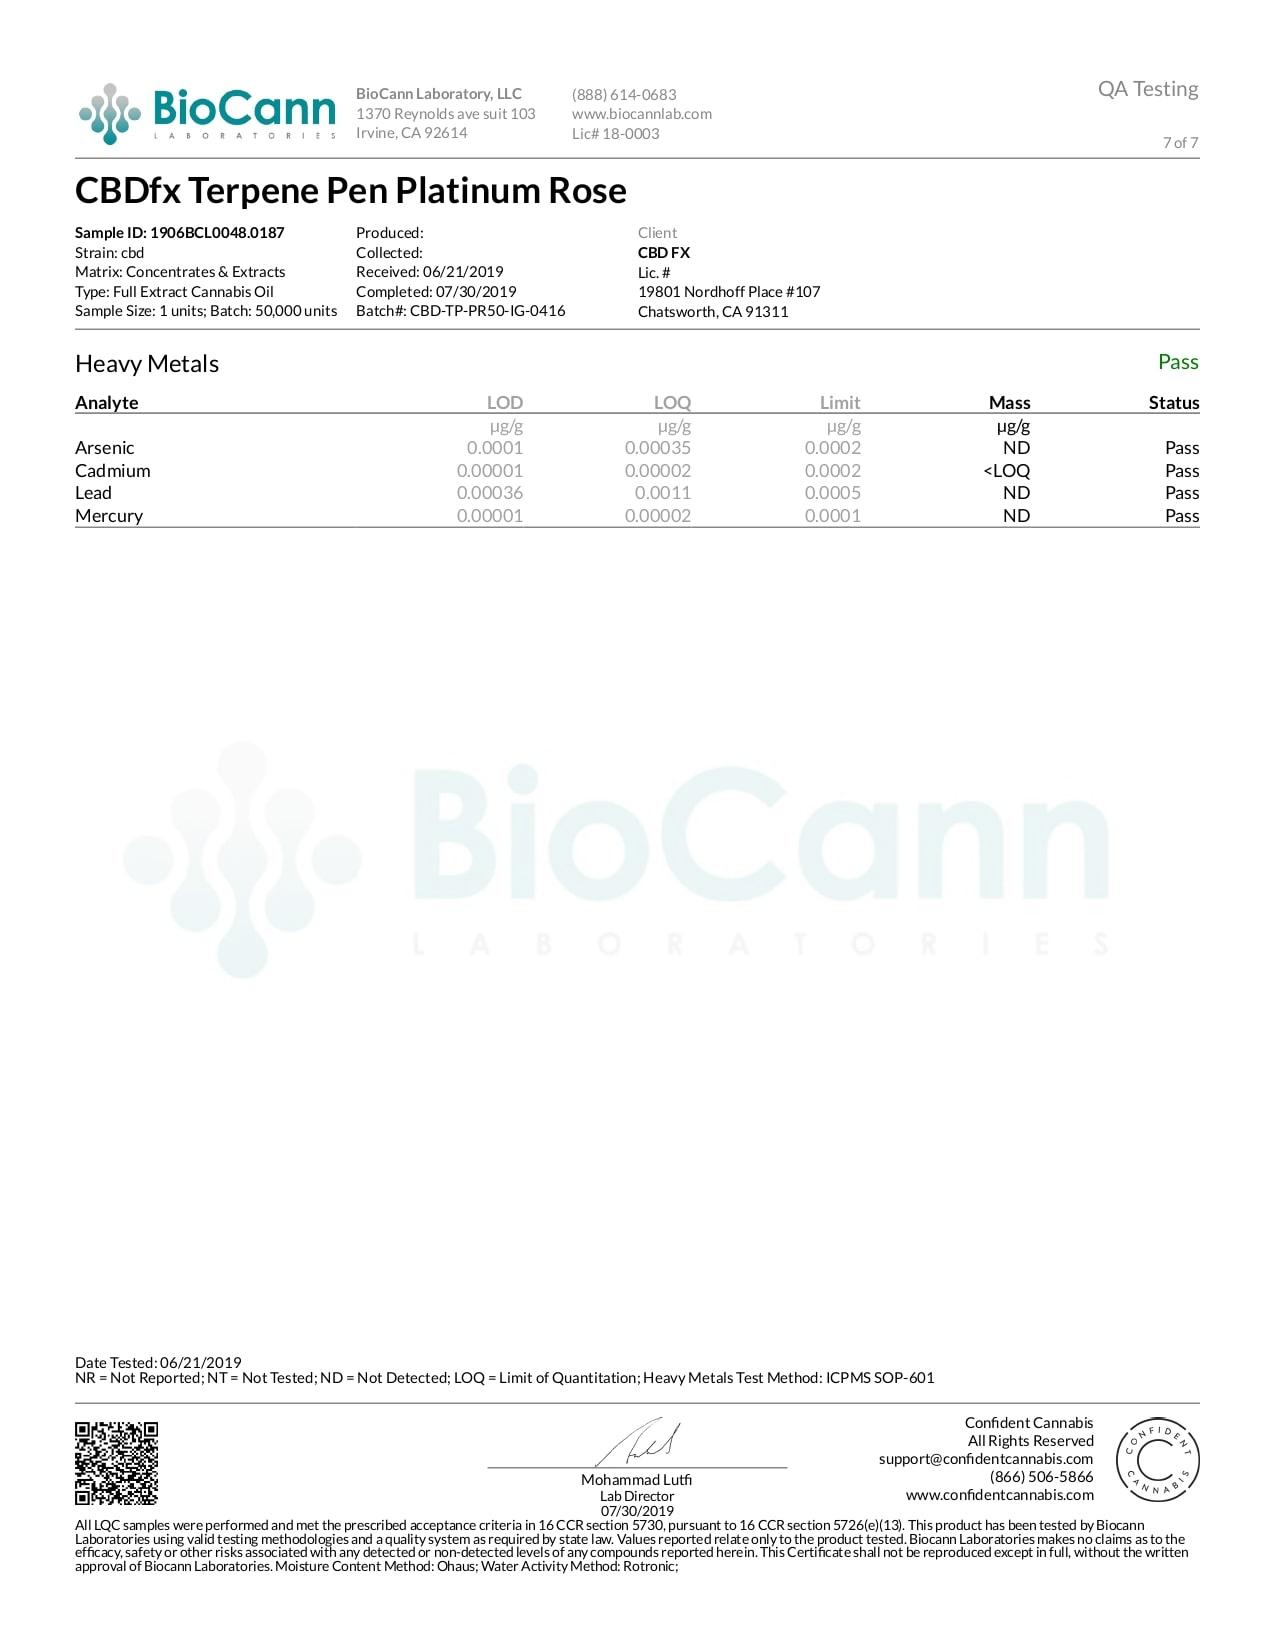 CBDfx Platinum Rose Lab Report CBD Terpenes Vape Pen 50mg